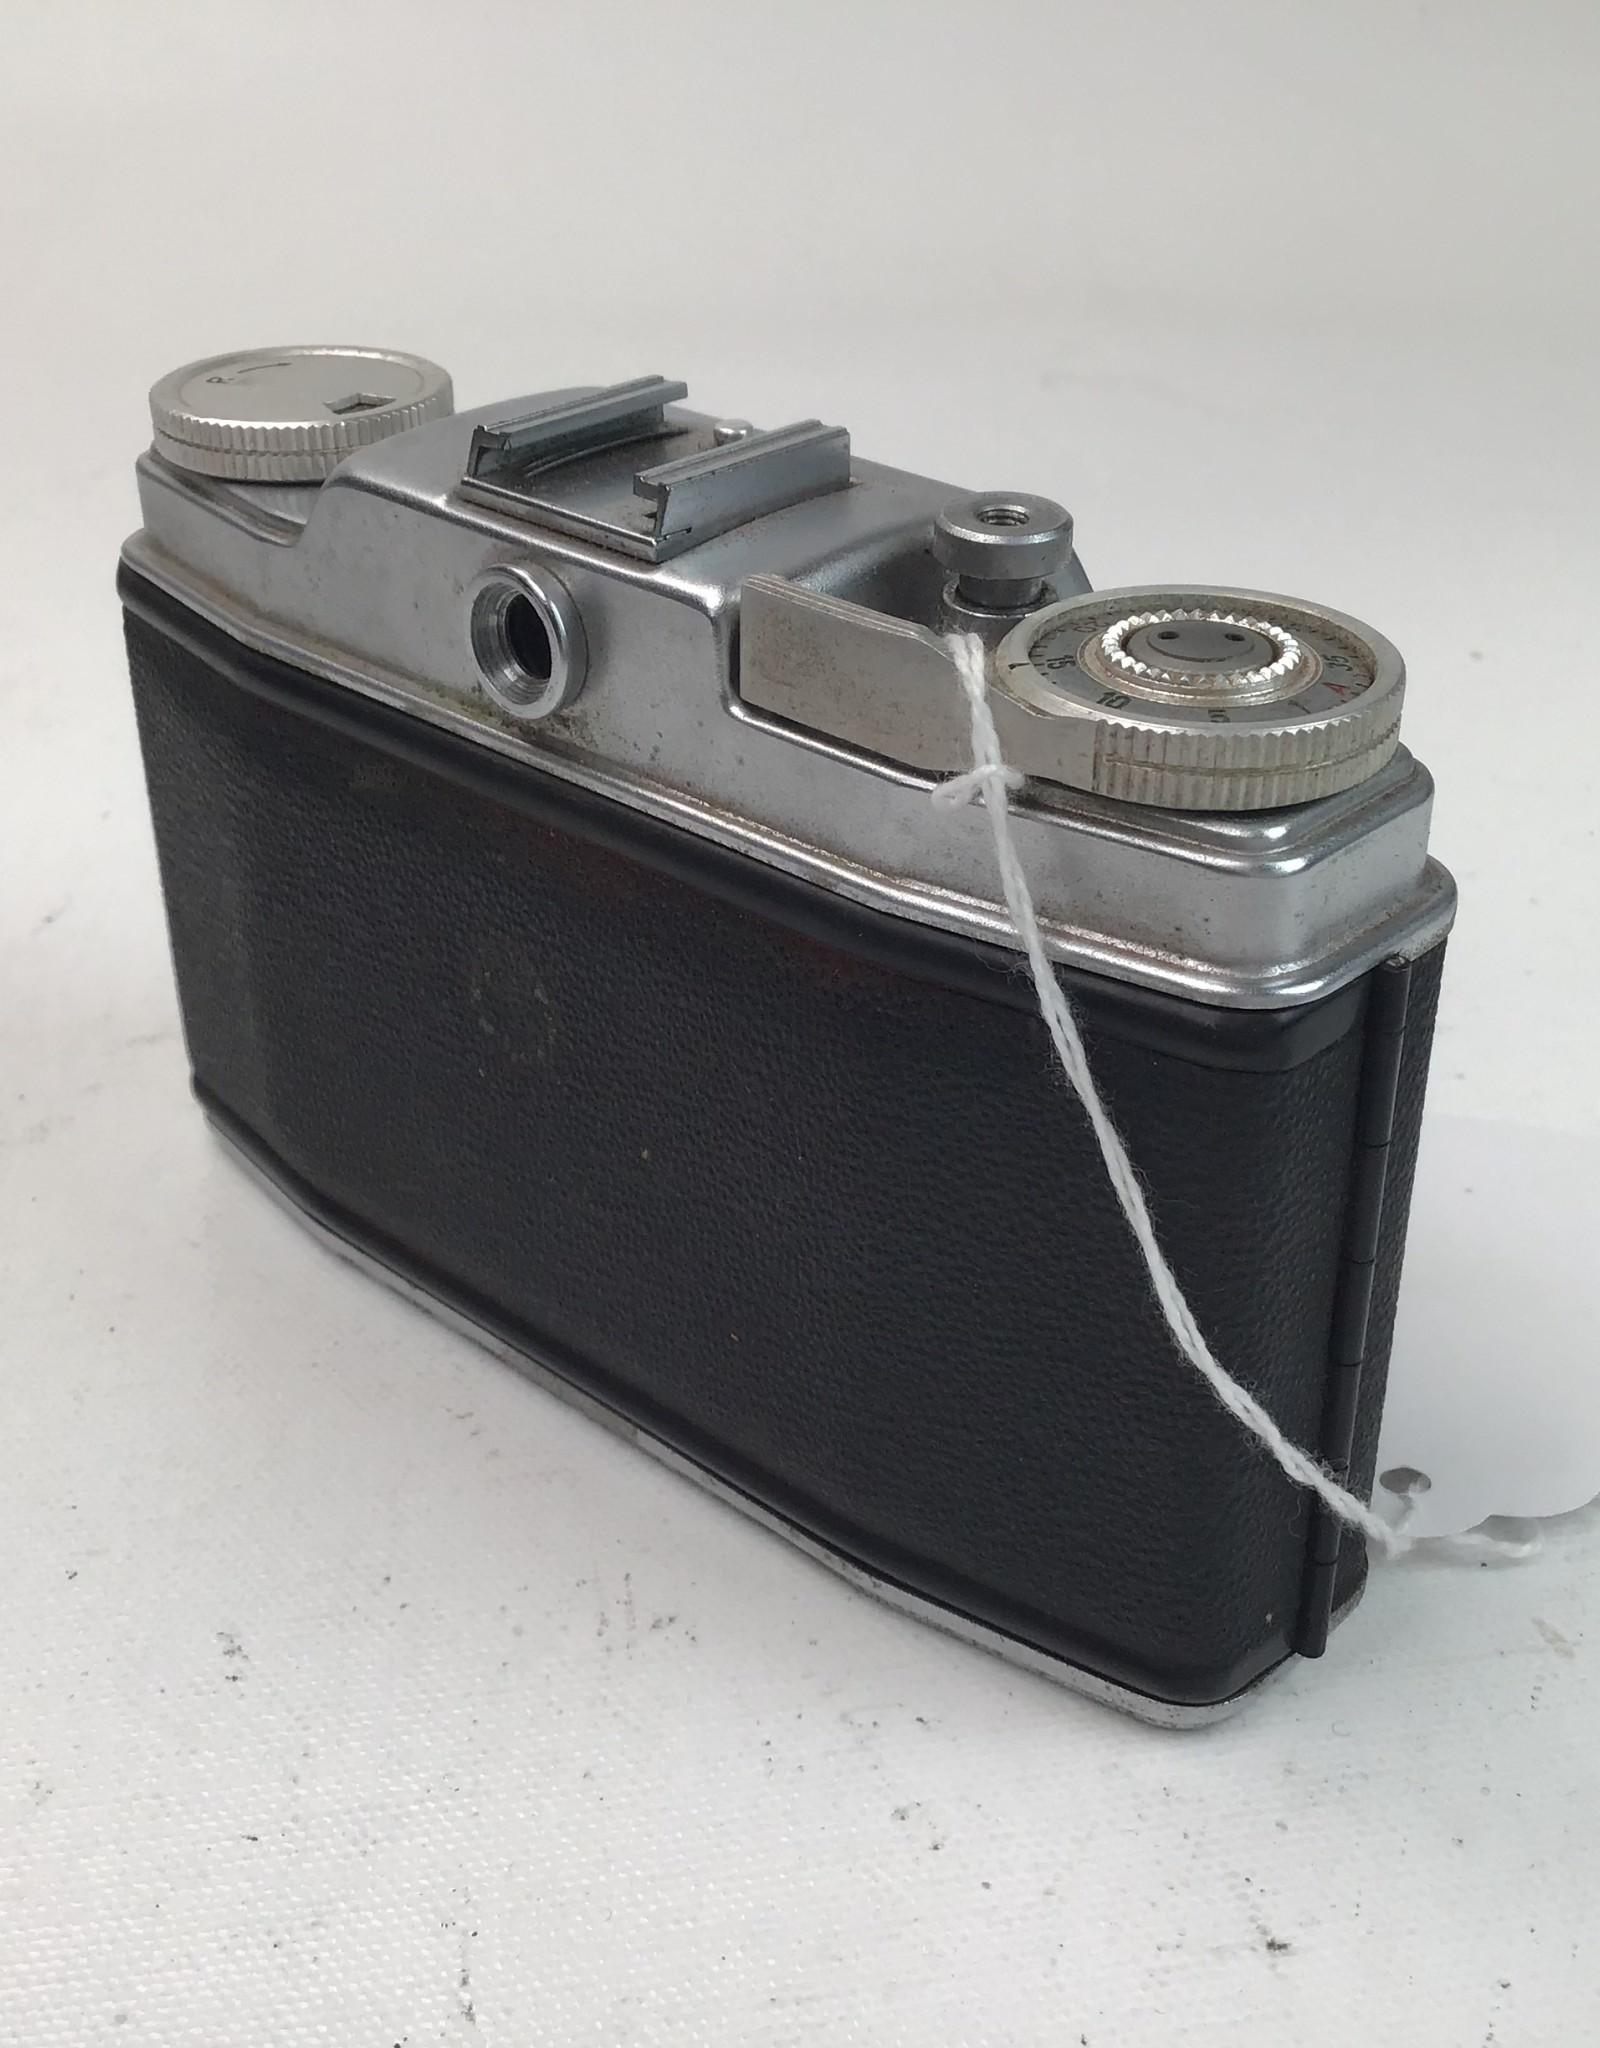 Ansco Pronto Camera Used Disp